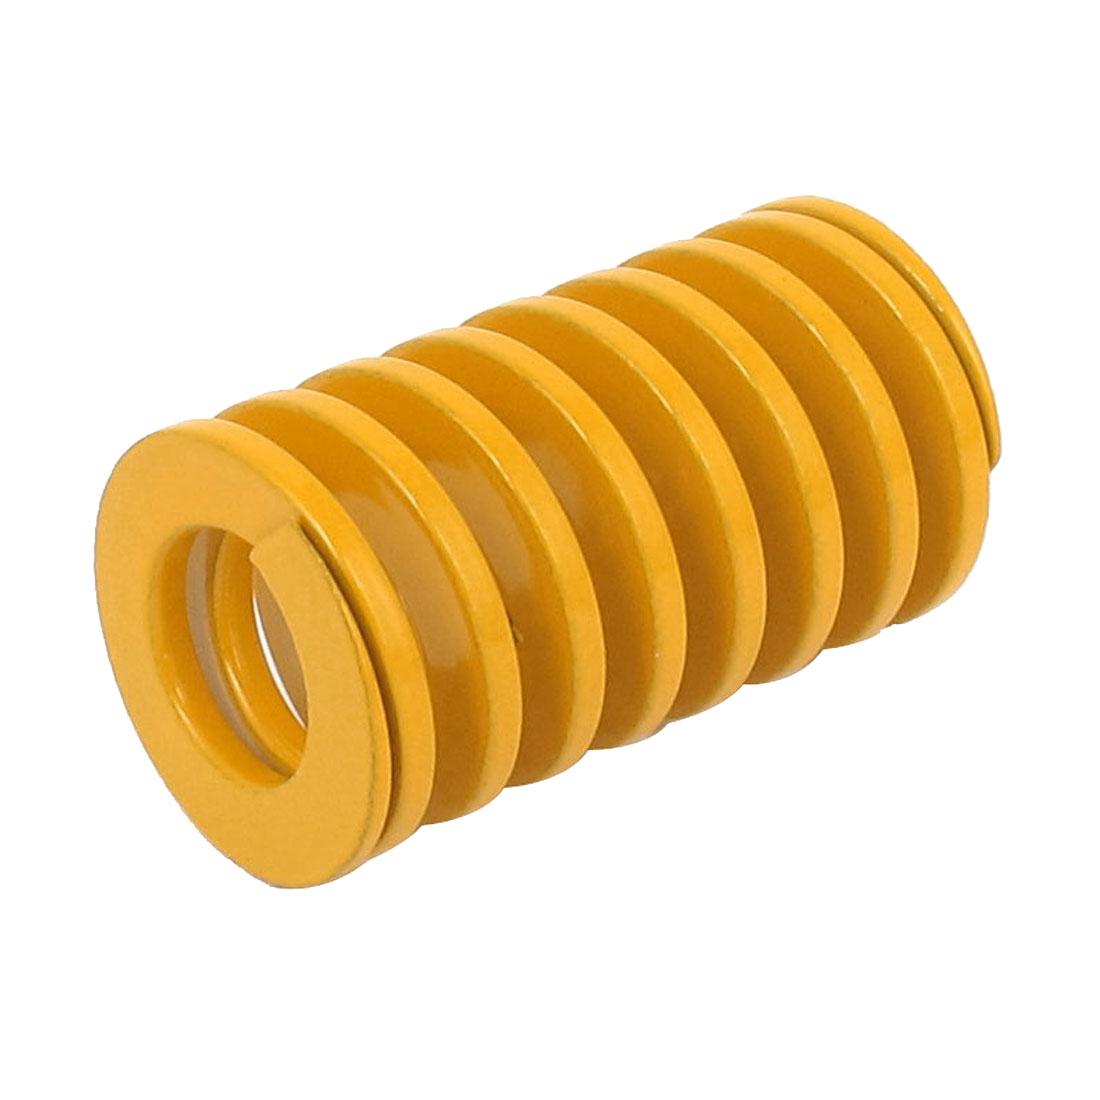 Orange 20mm x 10mm x 35mm Metal Tubular Section Mould Die Spring